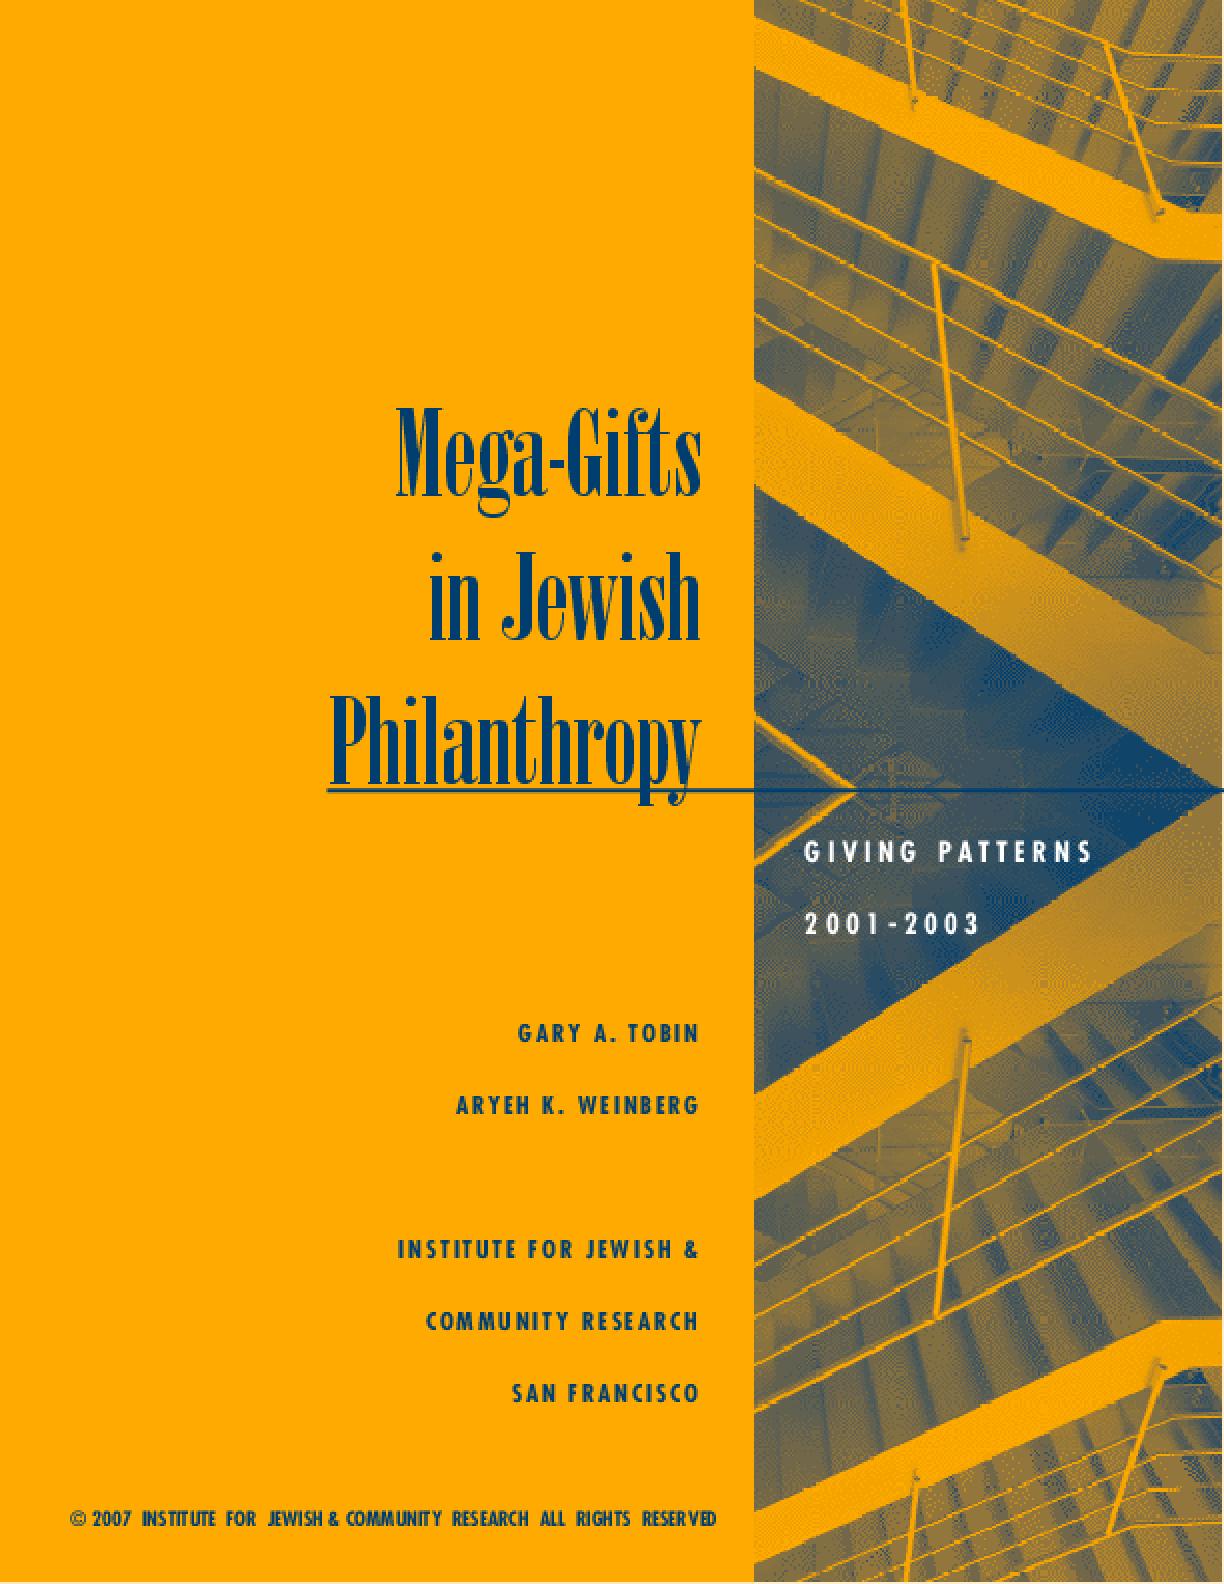 Mega-gifts in Jewish Philanthropy: Giving Patterns 2001-2003